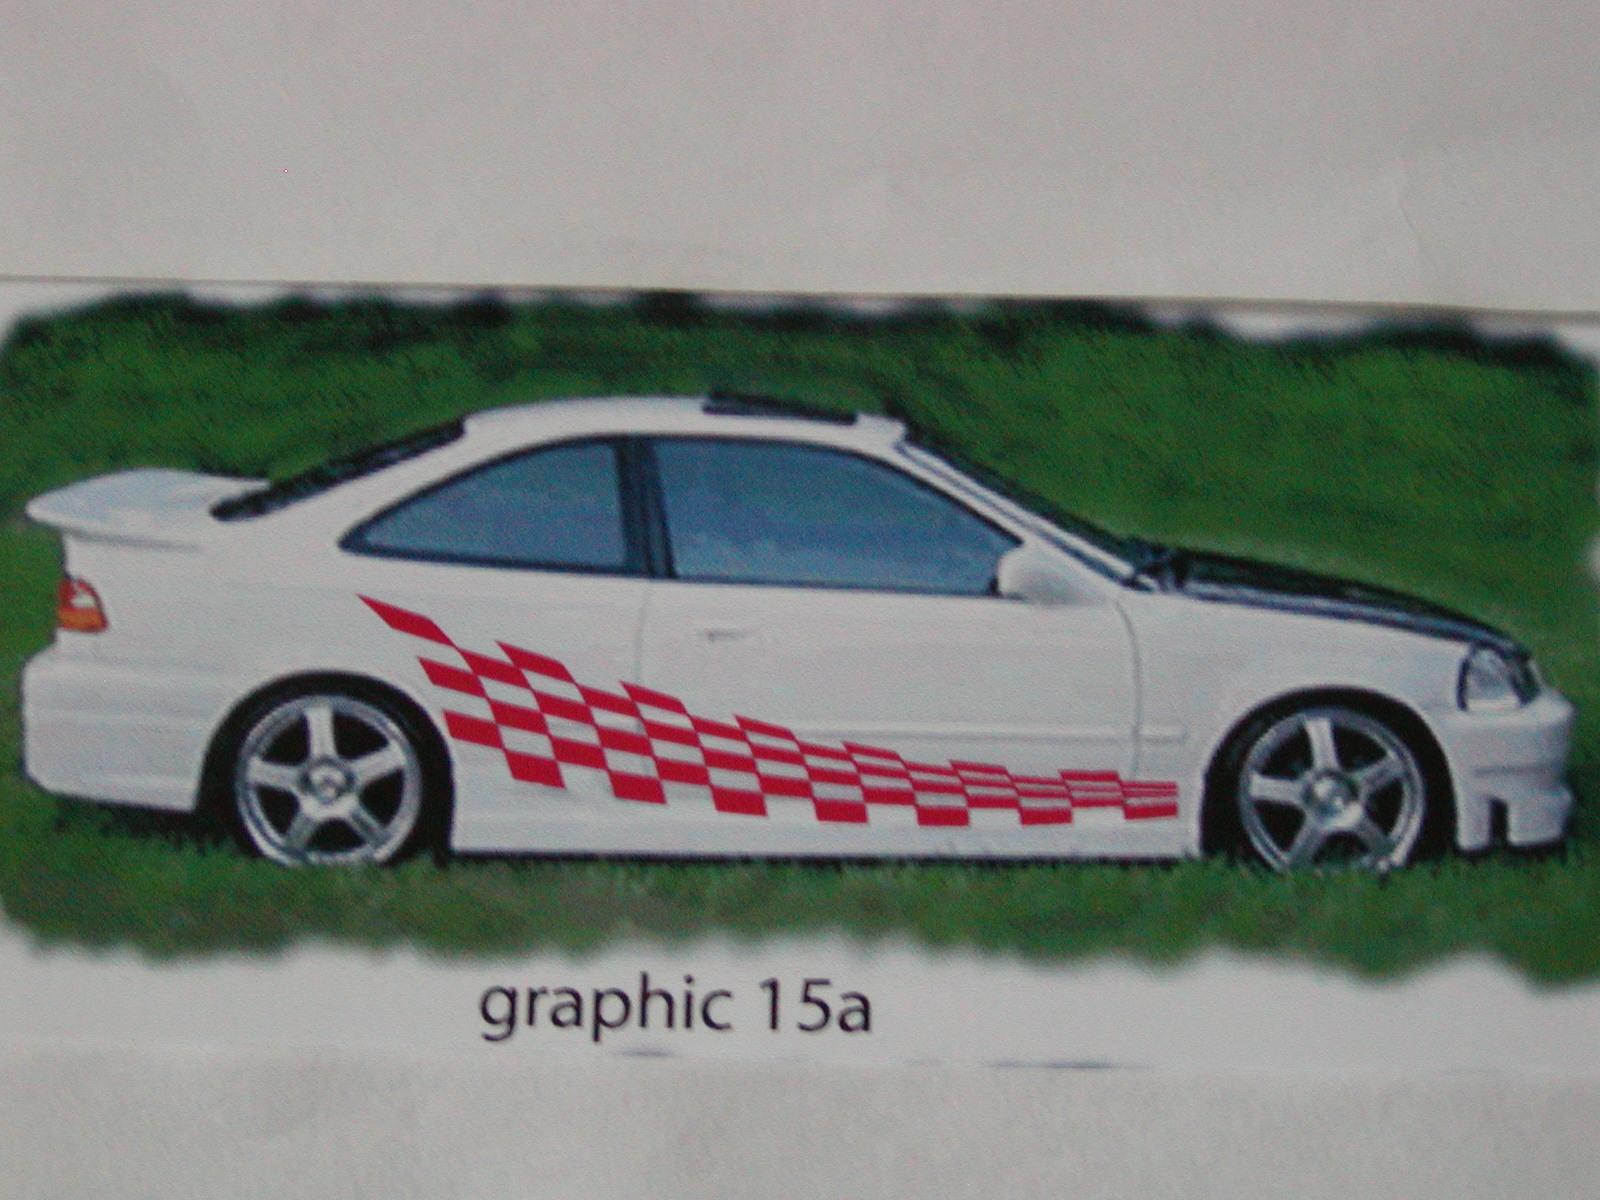 "Check Racing Graphics 15a Size 20"" x 74"""